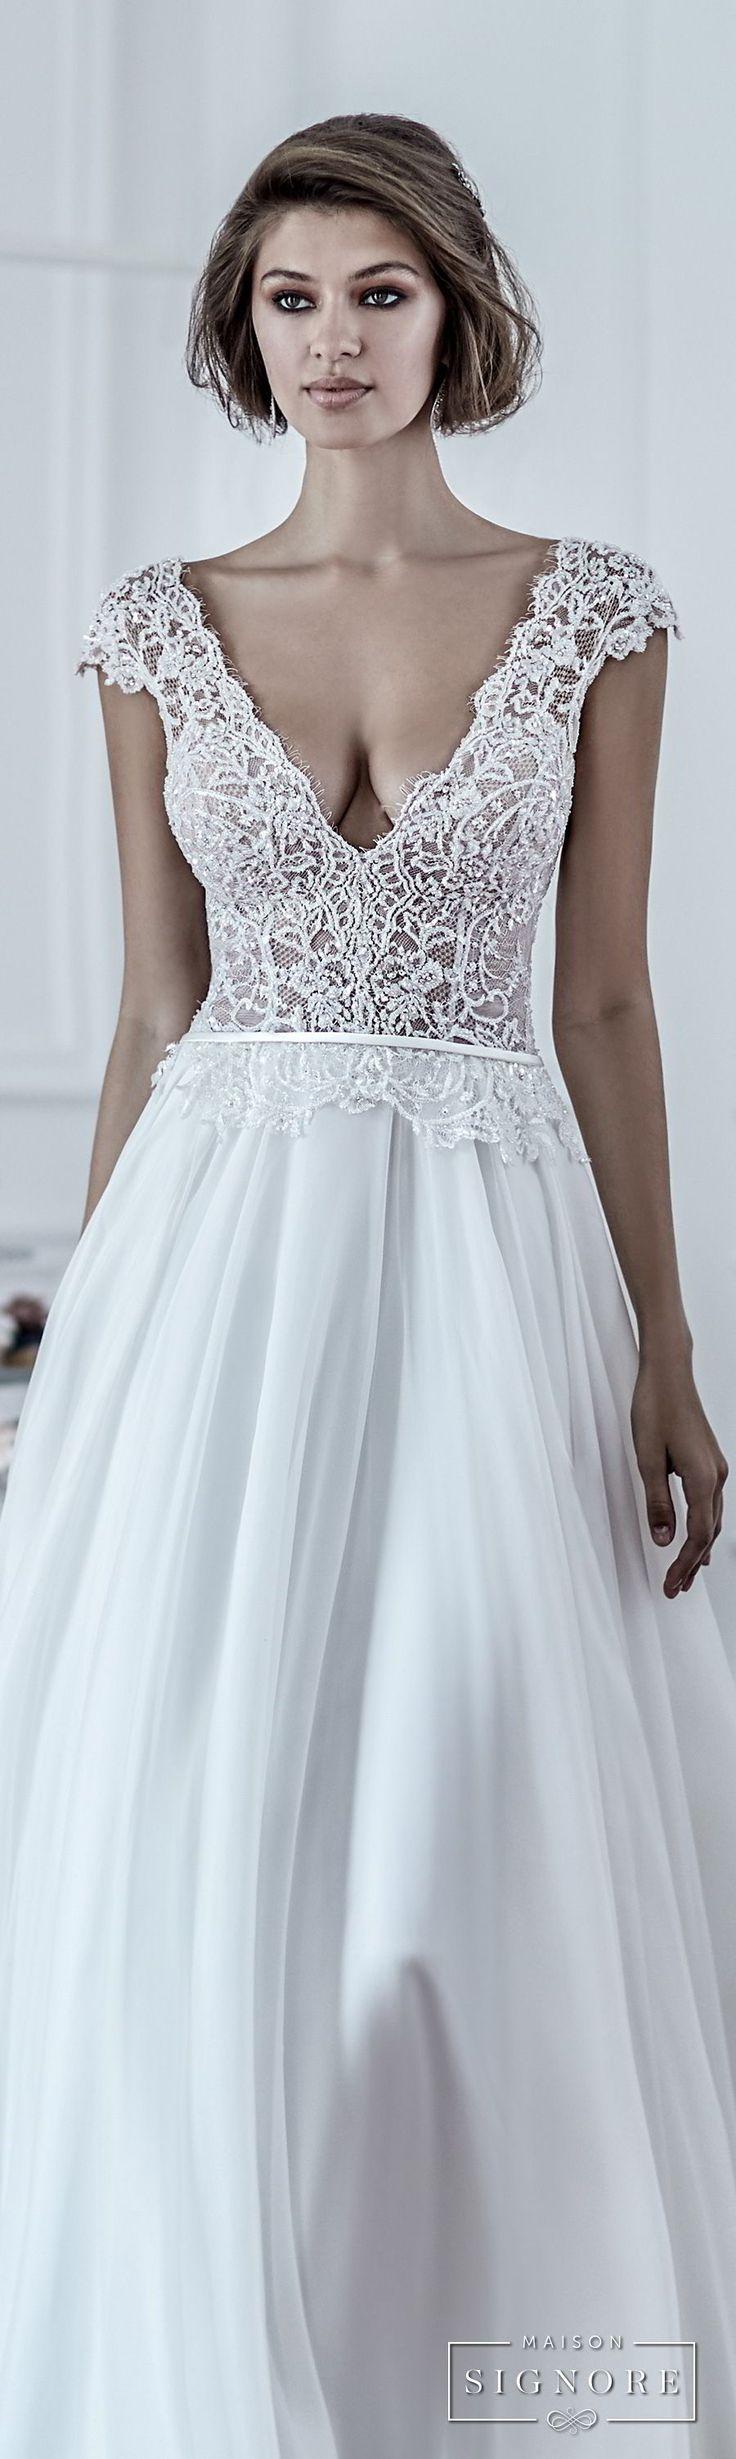 479 best Wedding Dresses images on Pinterest | Wedding dressses ...